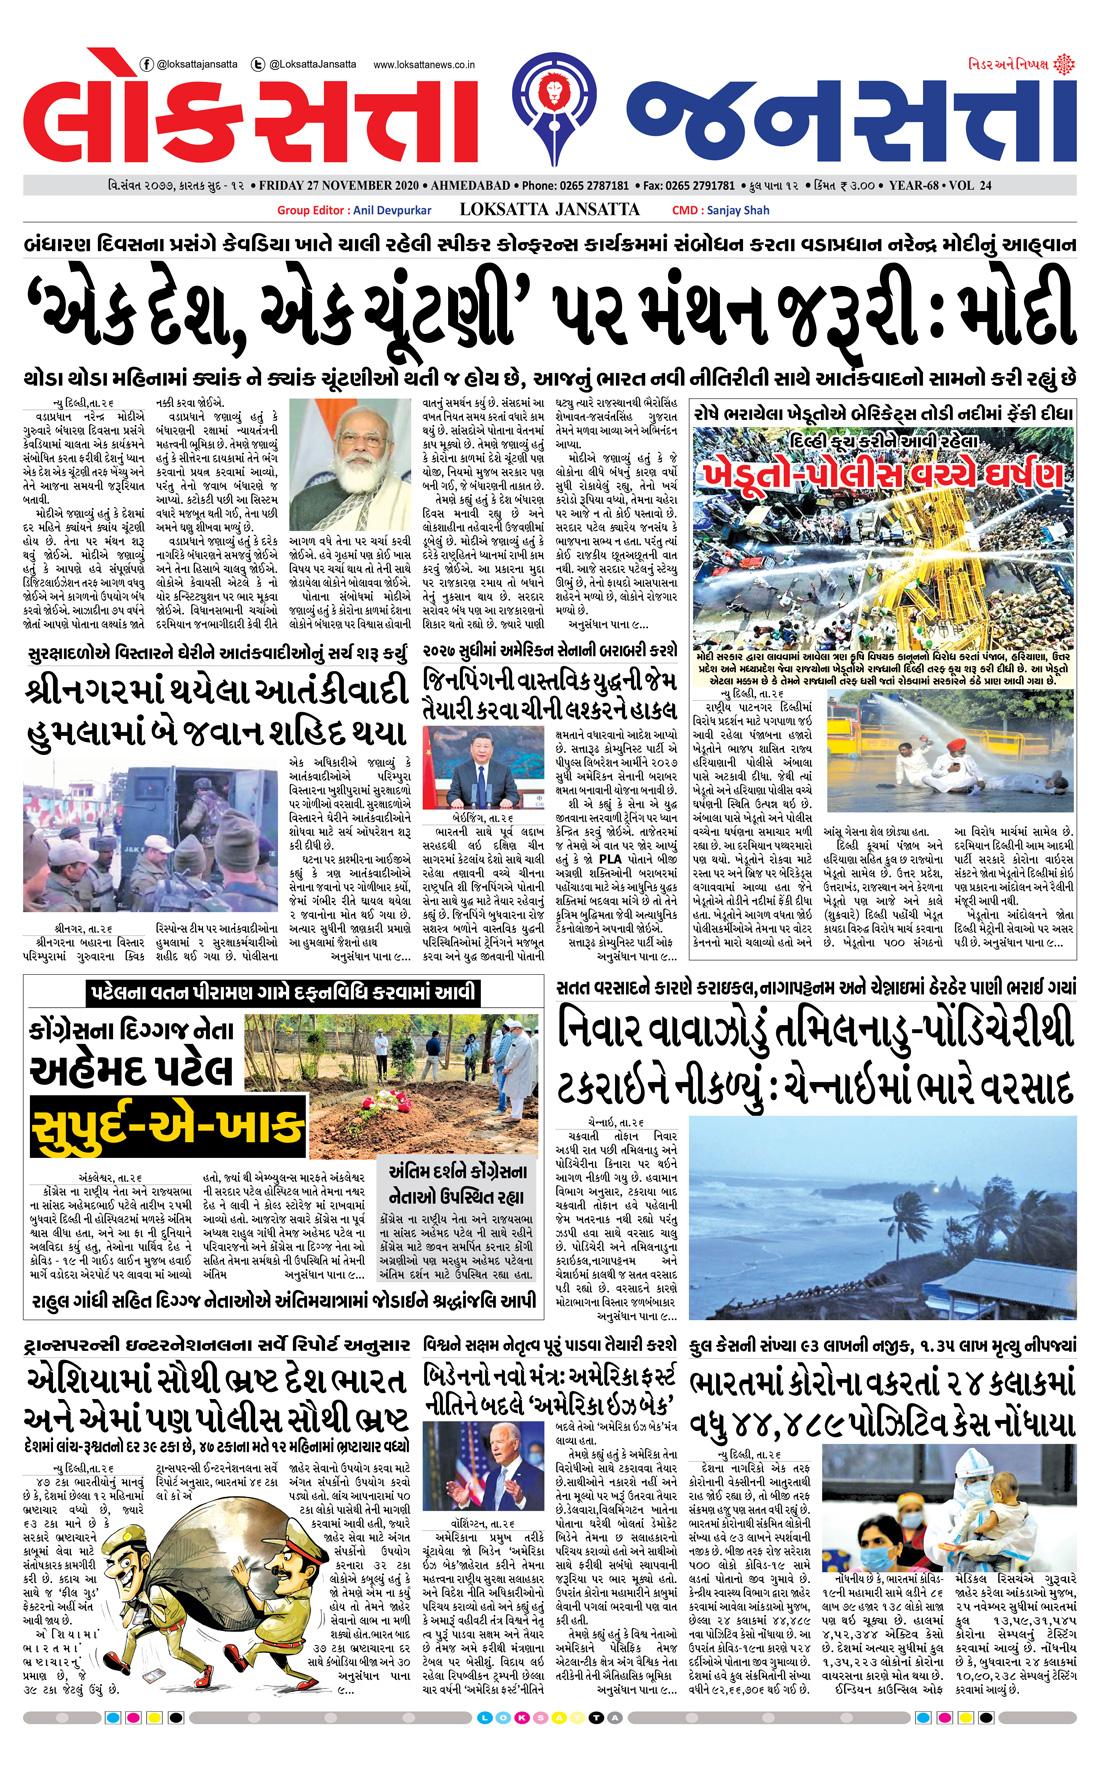 Loksatta Jansatta News Papaer E-paper dated 2020-11-27   Page 1